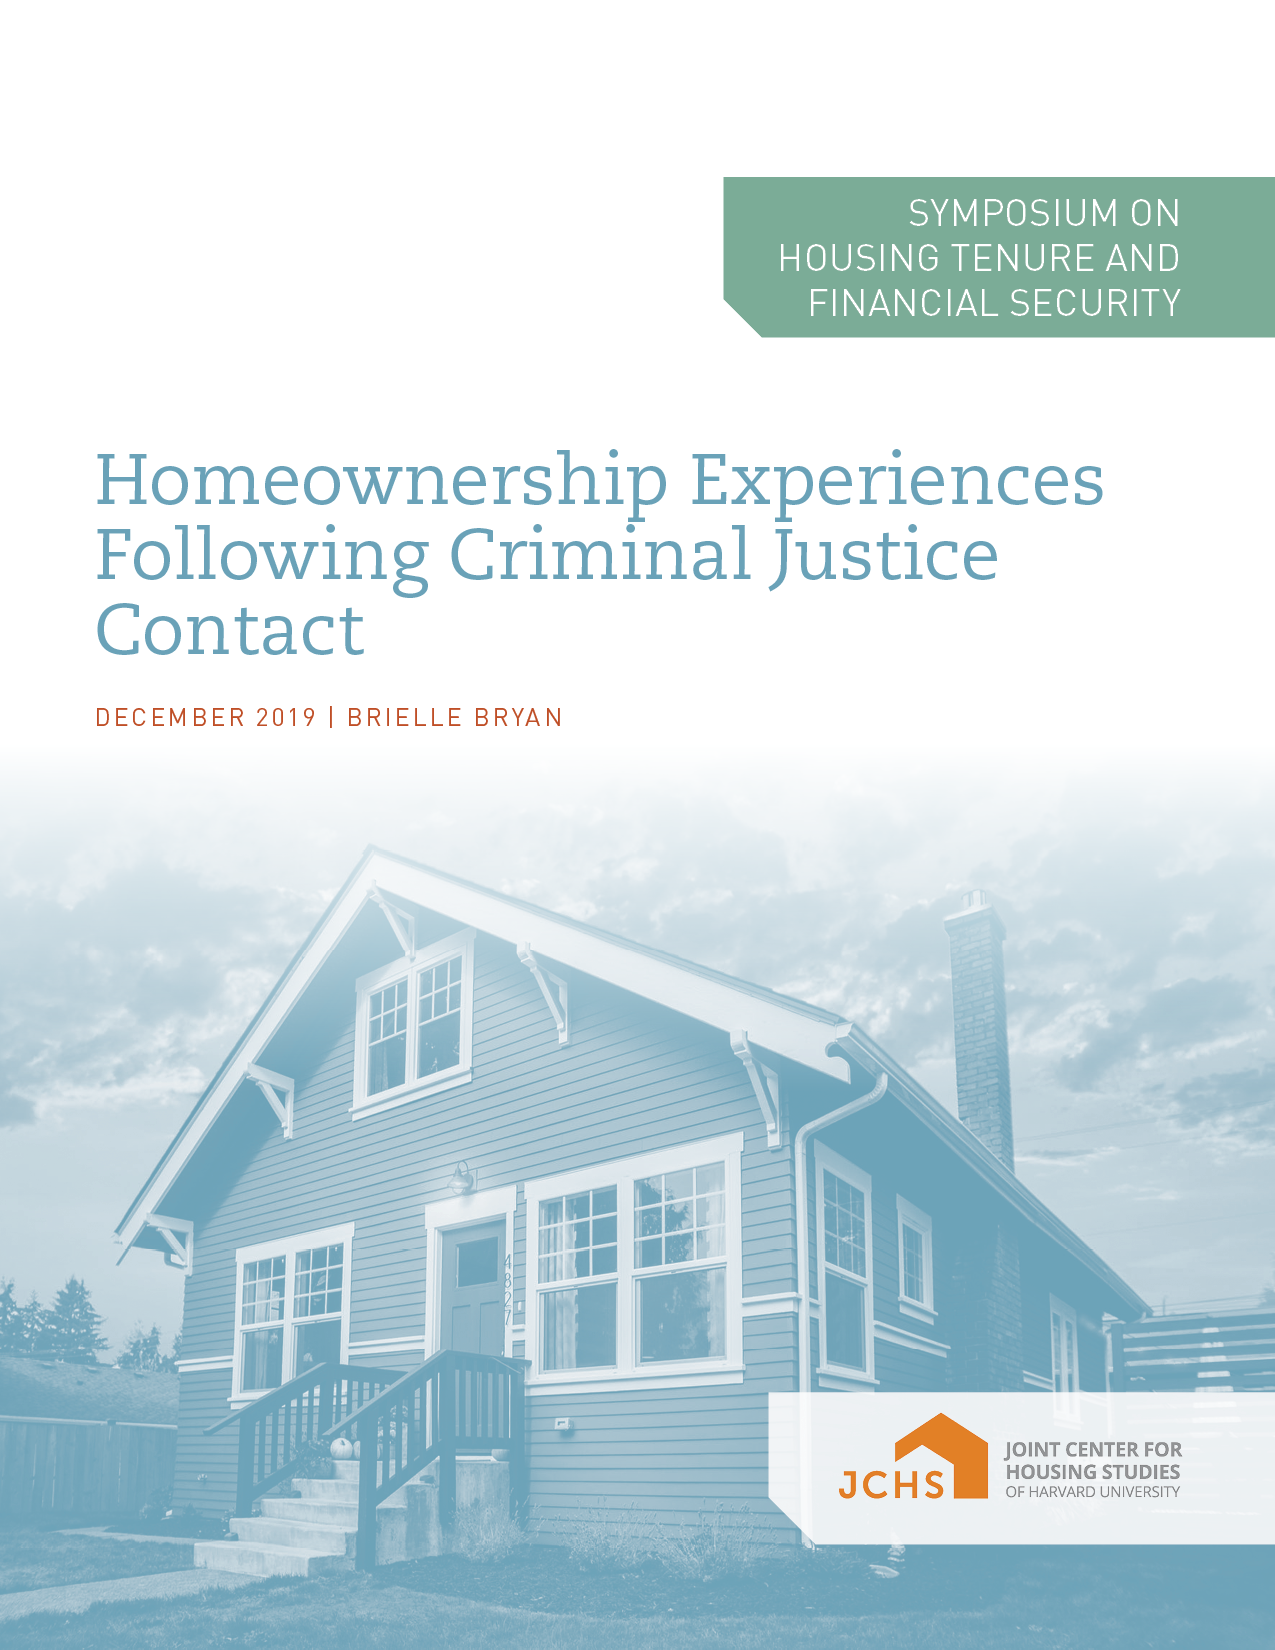 Homeownership Experiences Following Criminal Justice Contact